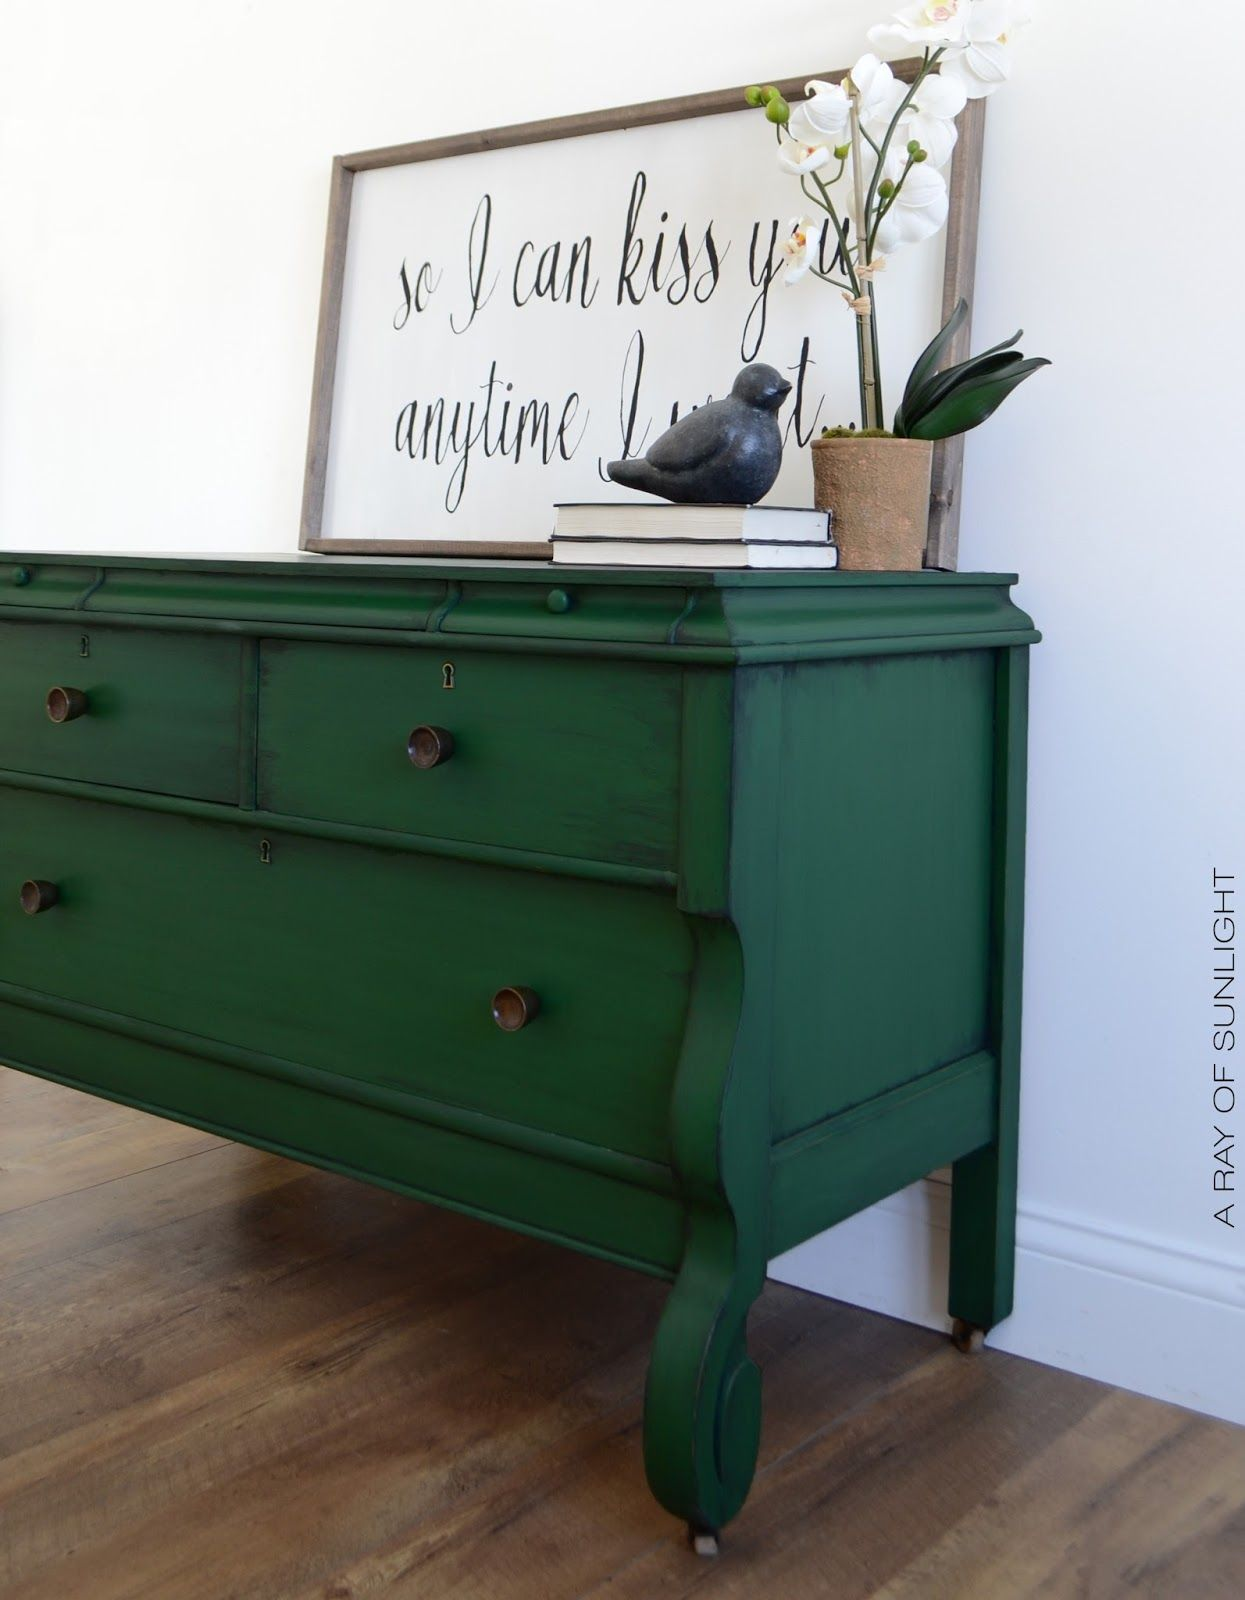 Green Empire Dresser Painted Furniture Redo Furniture Furniture Makeover [ 1600 x 1245 Pixel ]